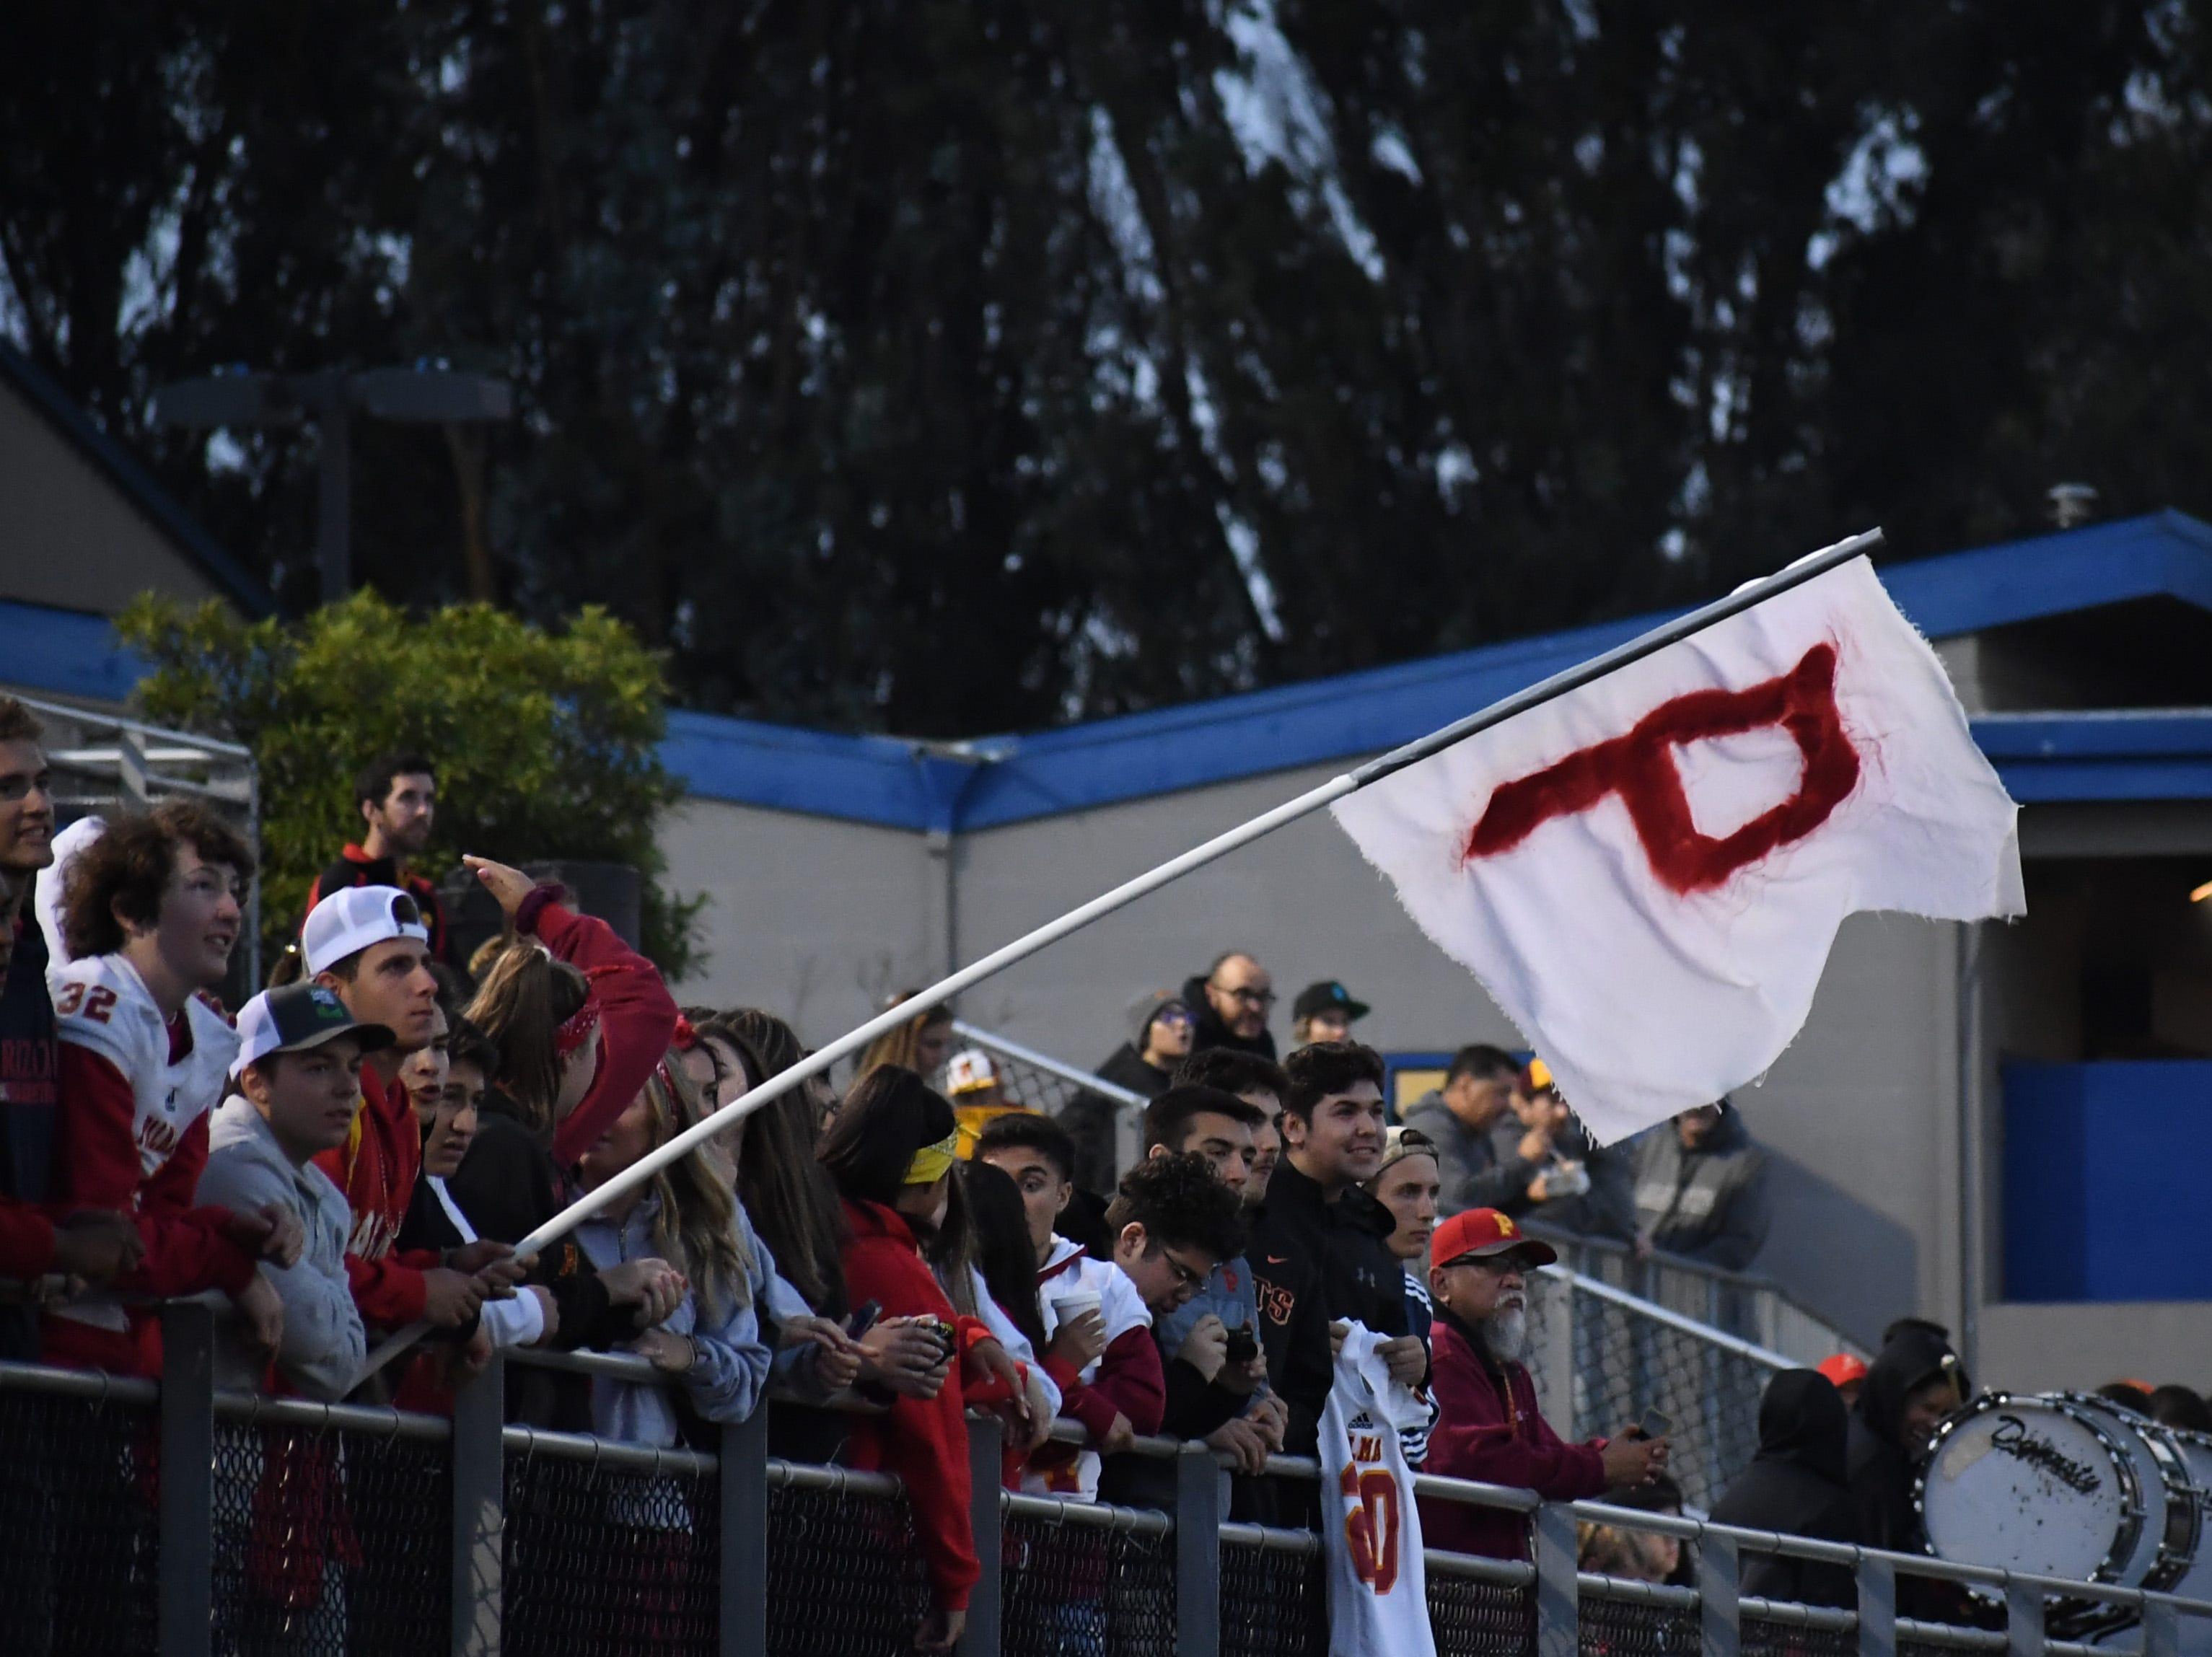 Palma won its game against Sacred Heart Cathedral 17-14 Friday night at Rabobank Stadium.